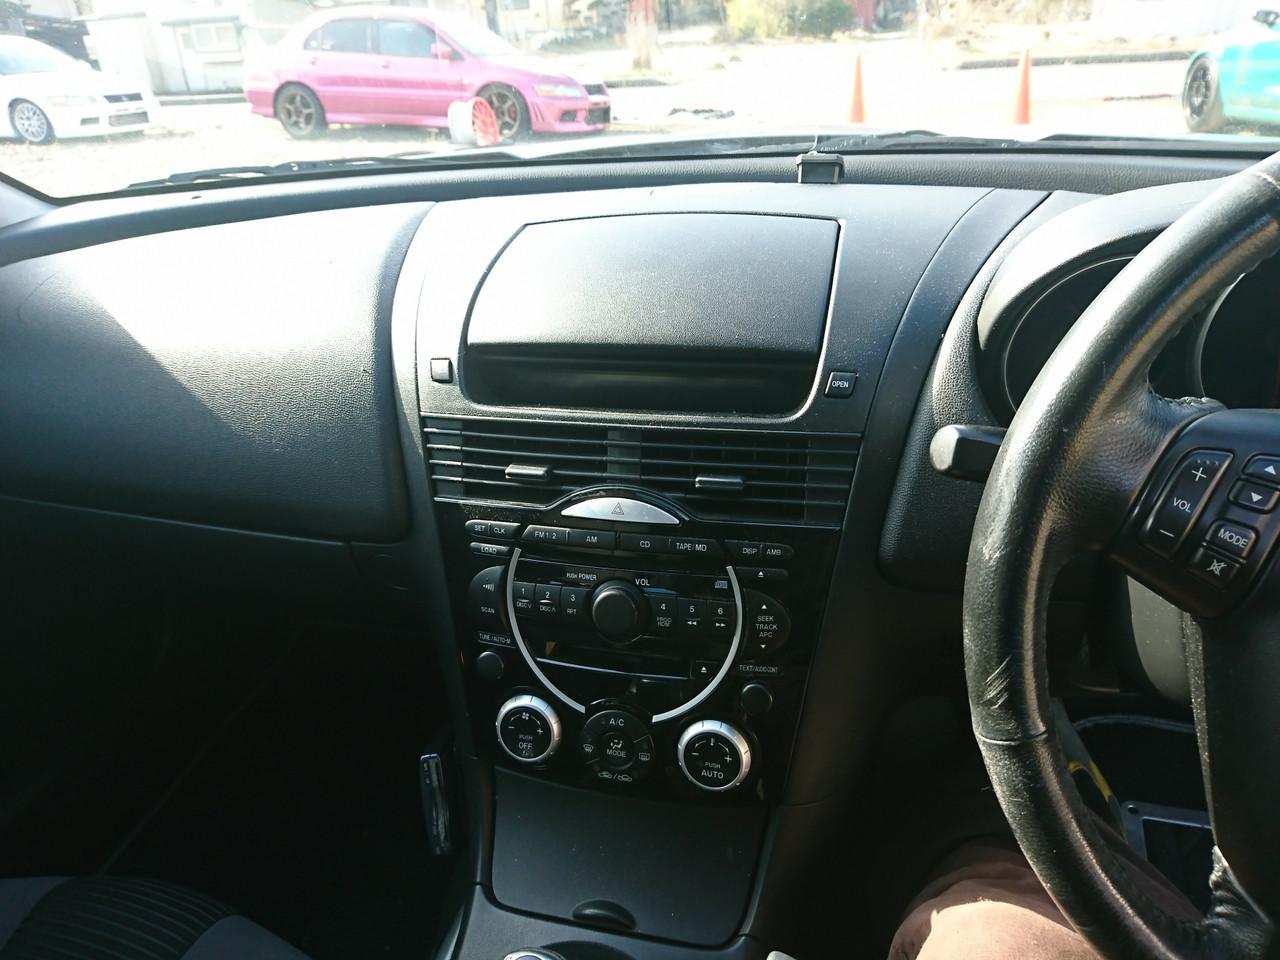 2003 Mazda RX-8 5 M/T